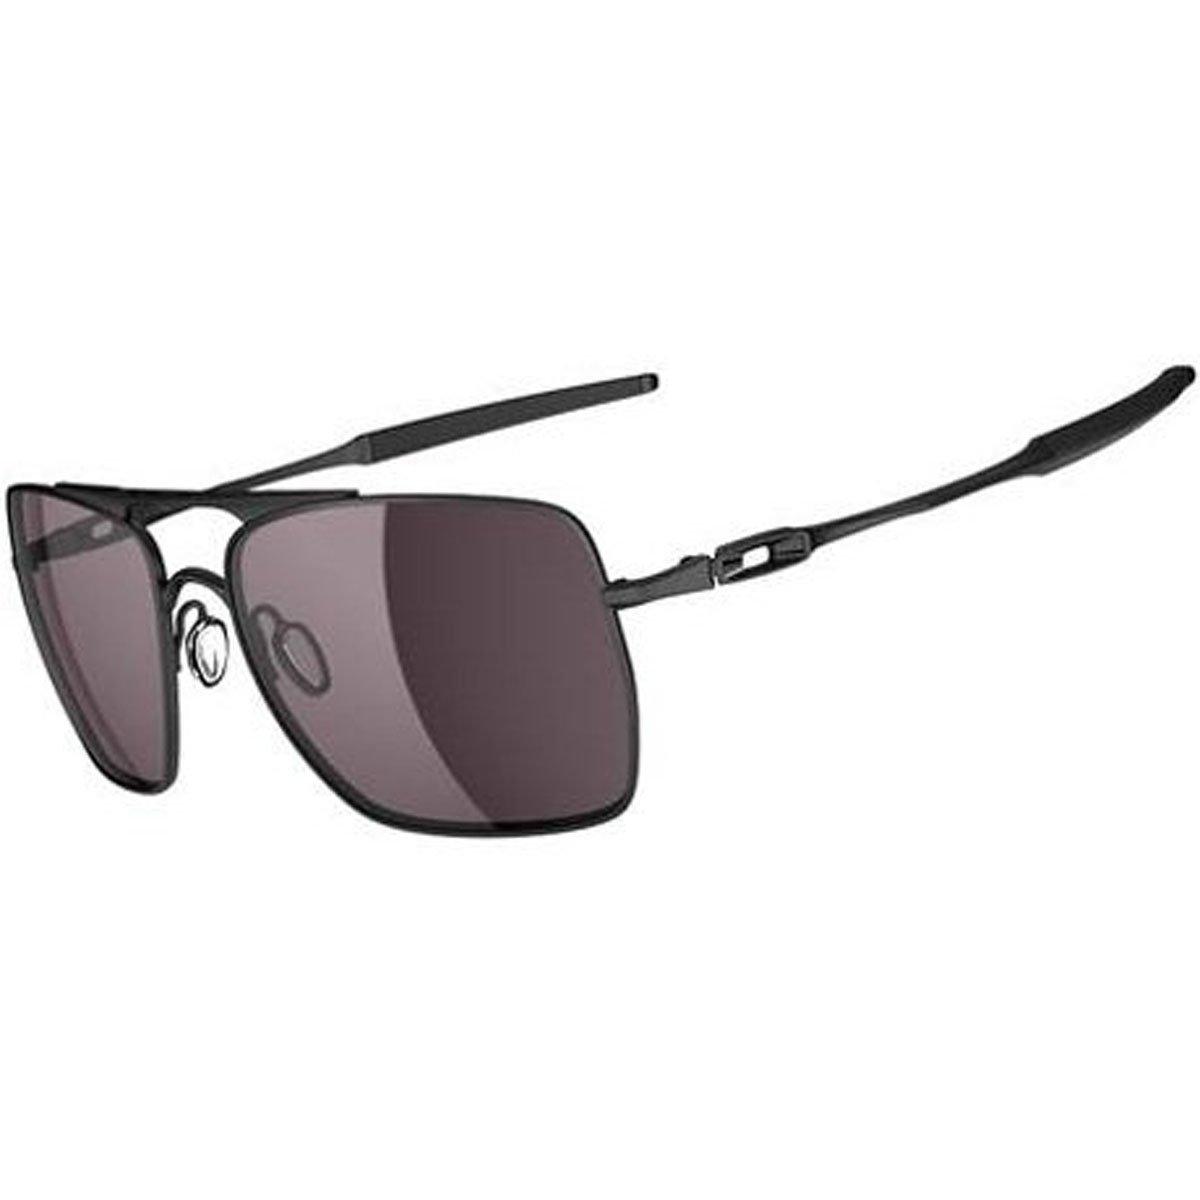 amazon com oakley deviation men s lifestyle designer sunglasses rh amazon com